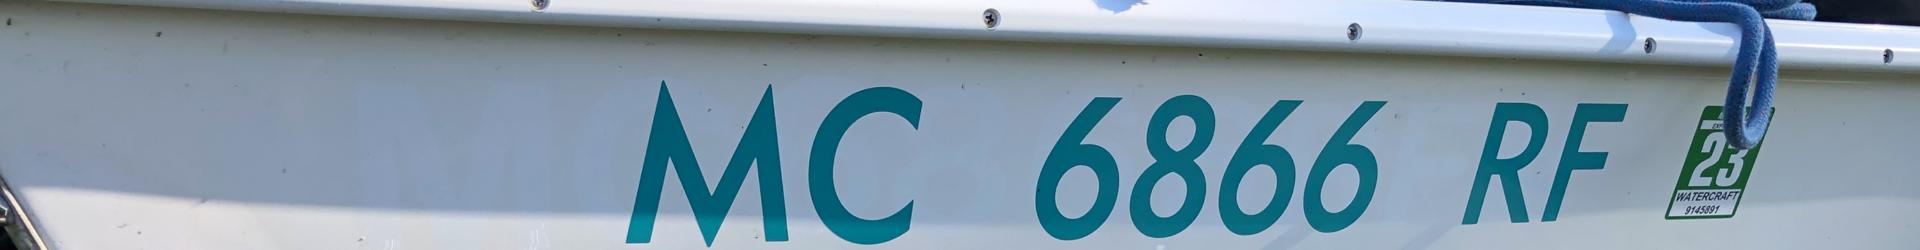 Boat Registration Stickers.com